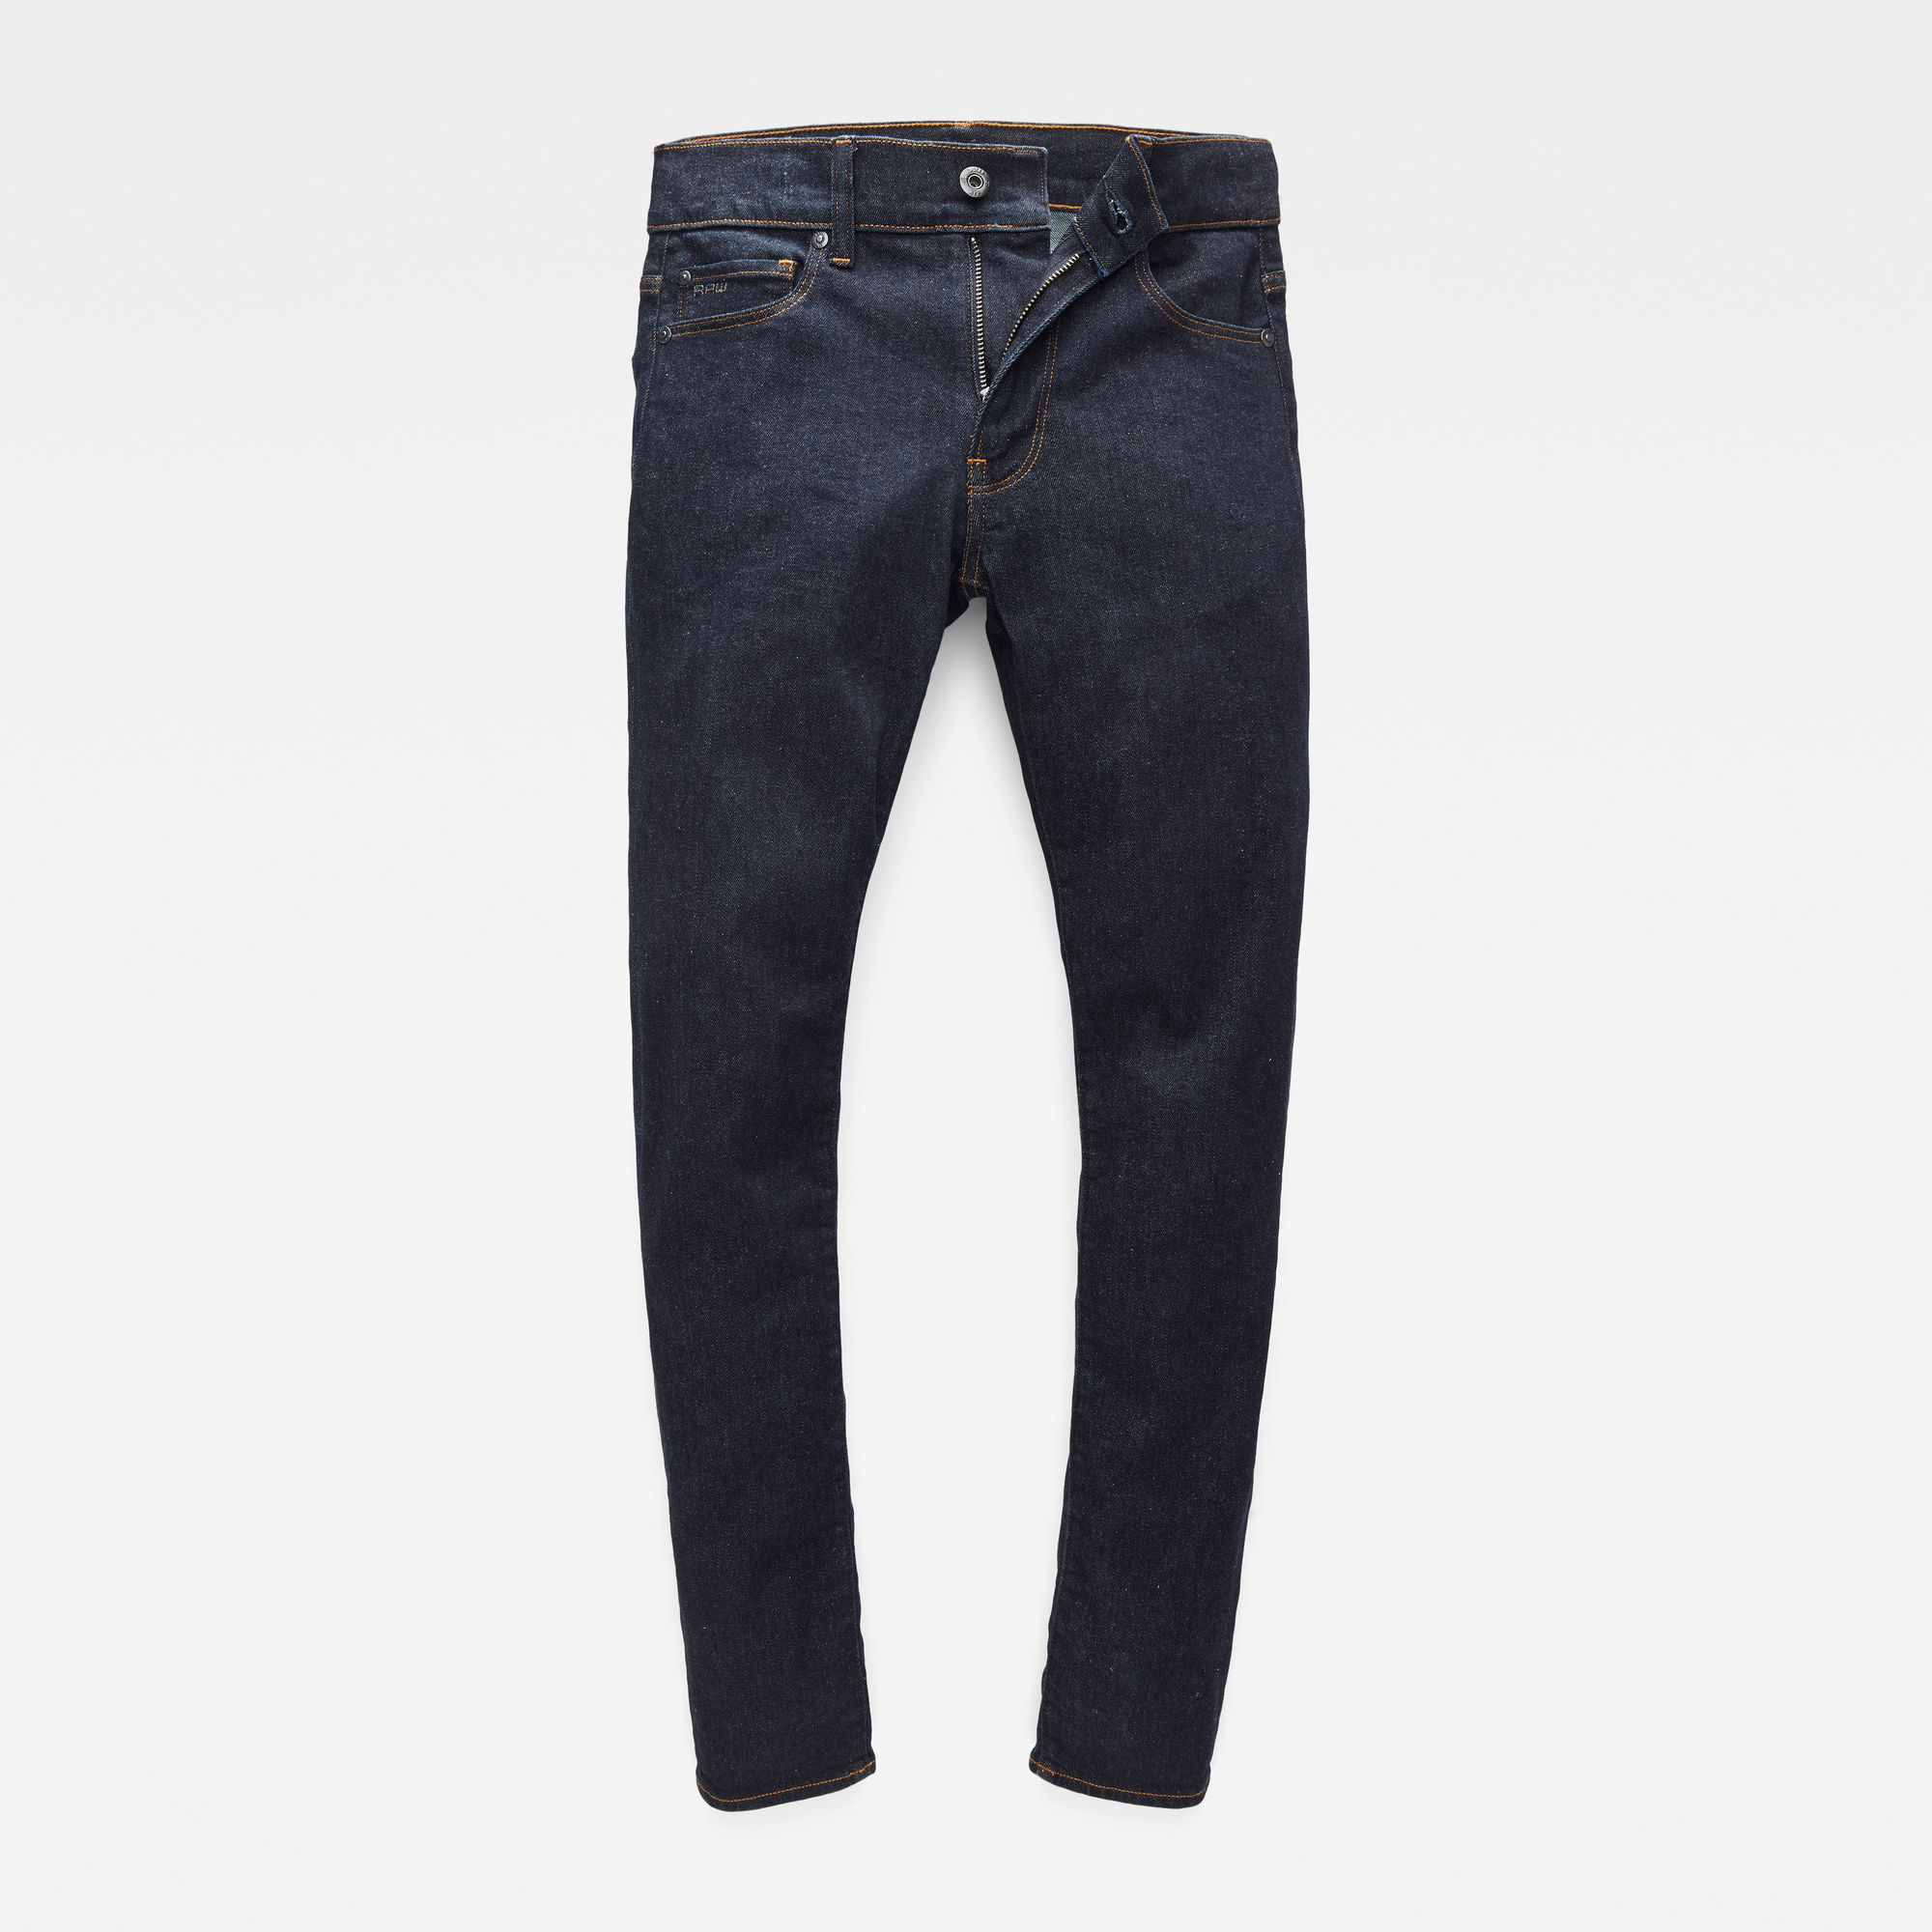 G-Star RAW Jongens 3301 Skinny jeans Donkerblauw